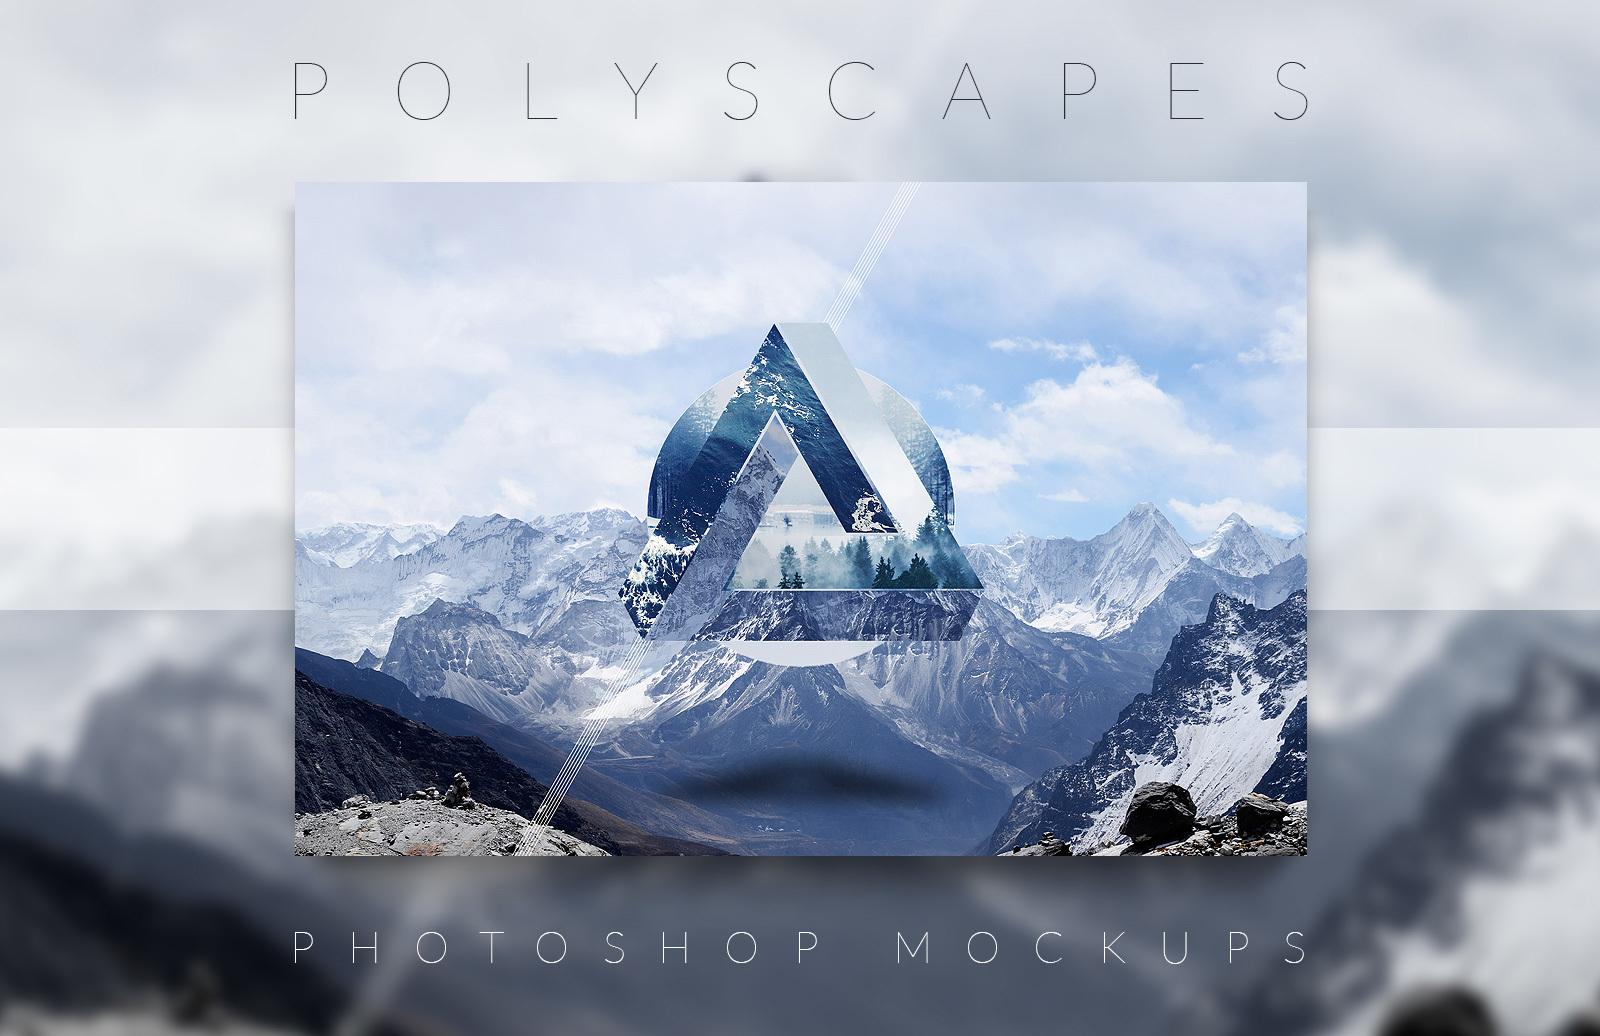 Polyscape Generator Photoshop Mockups 1